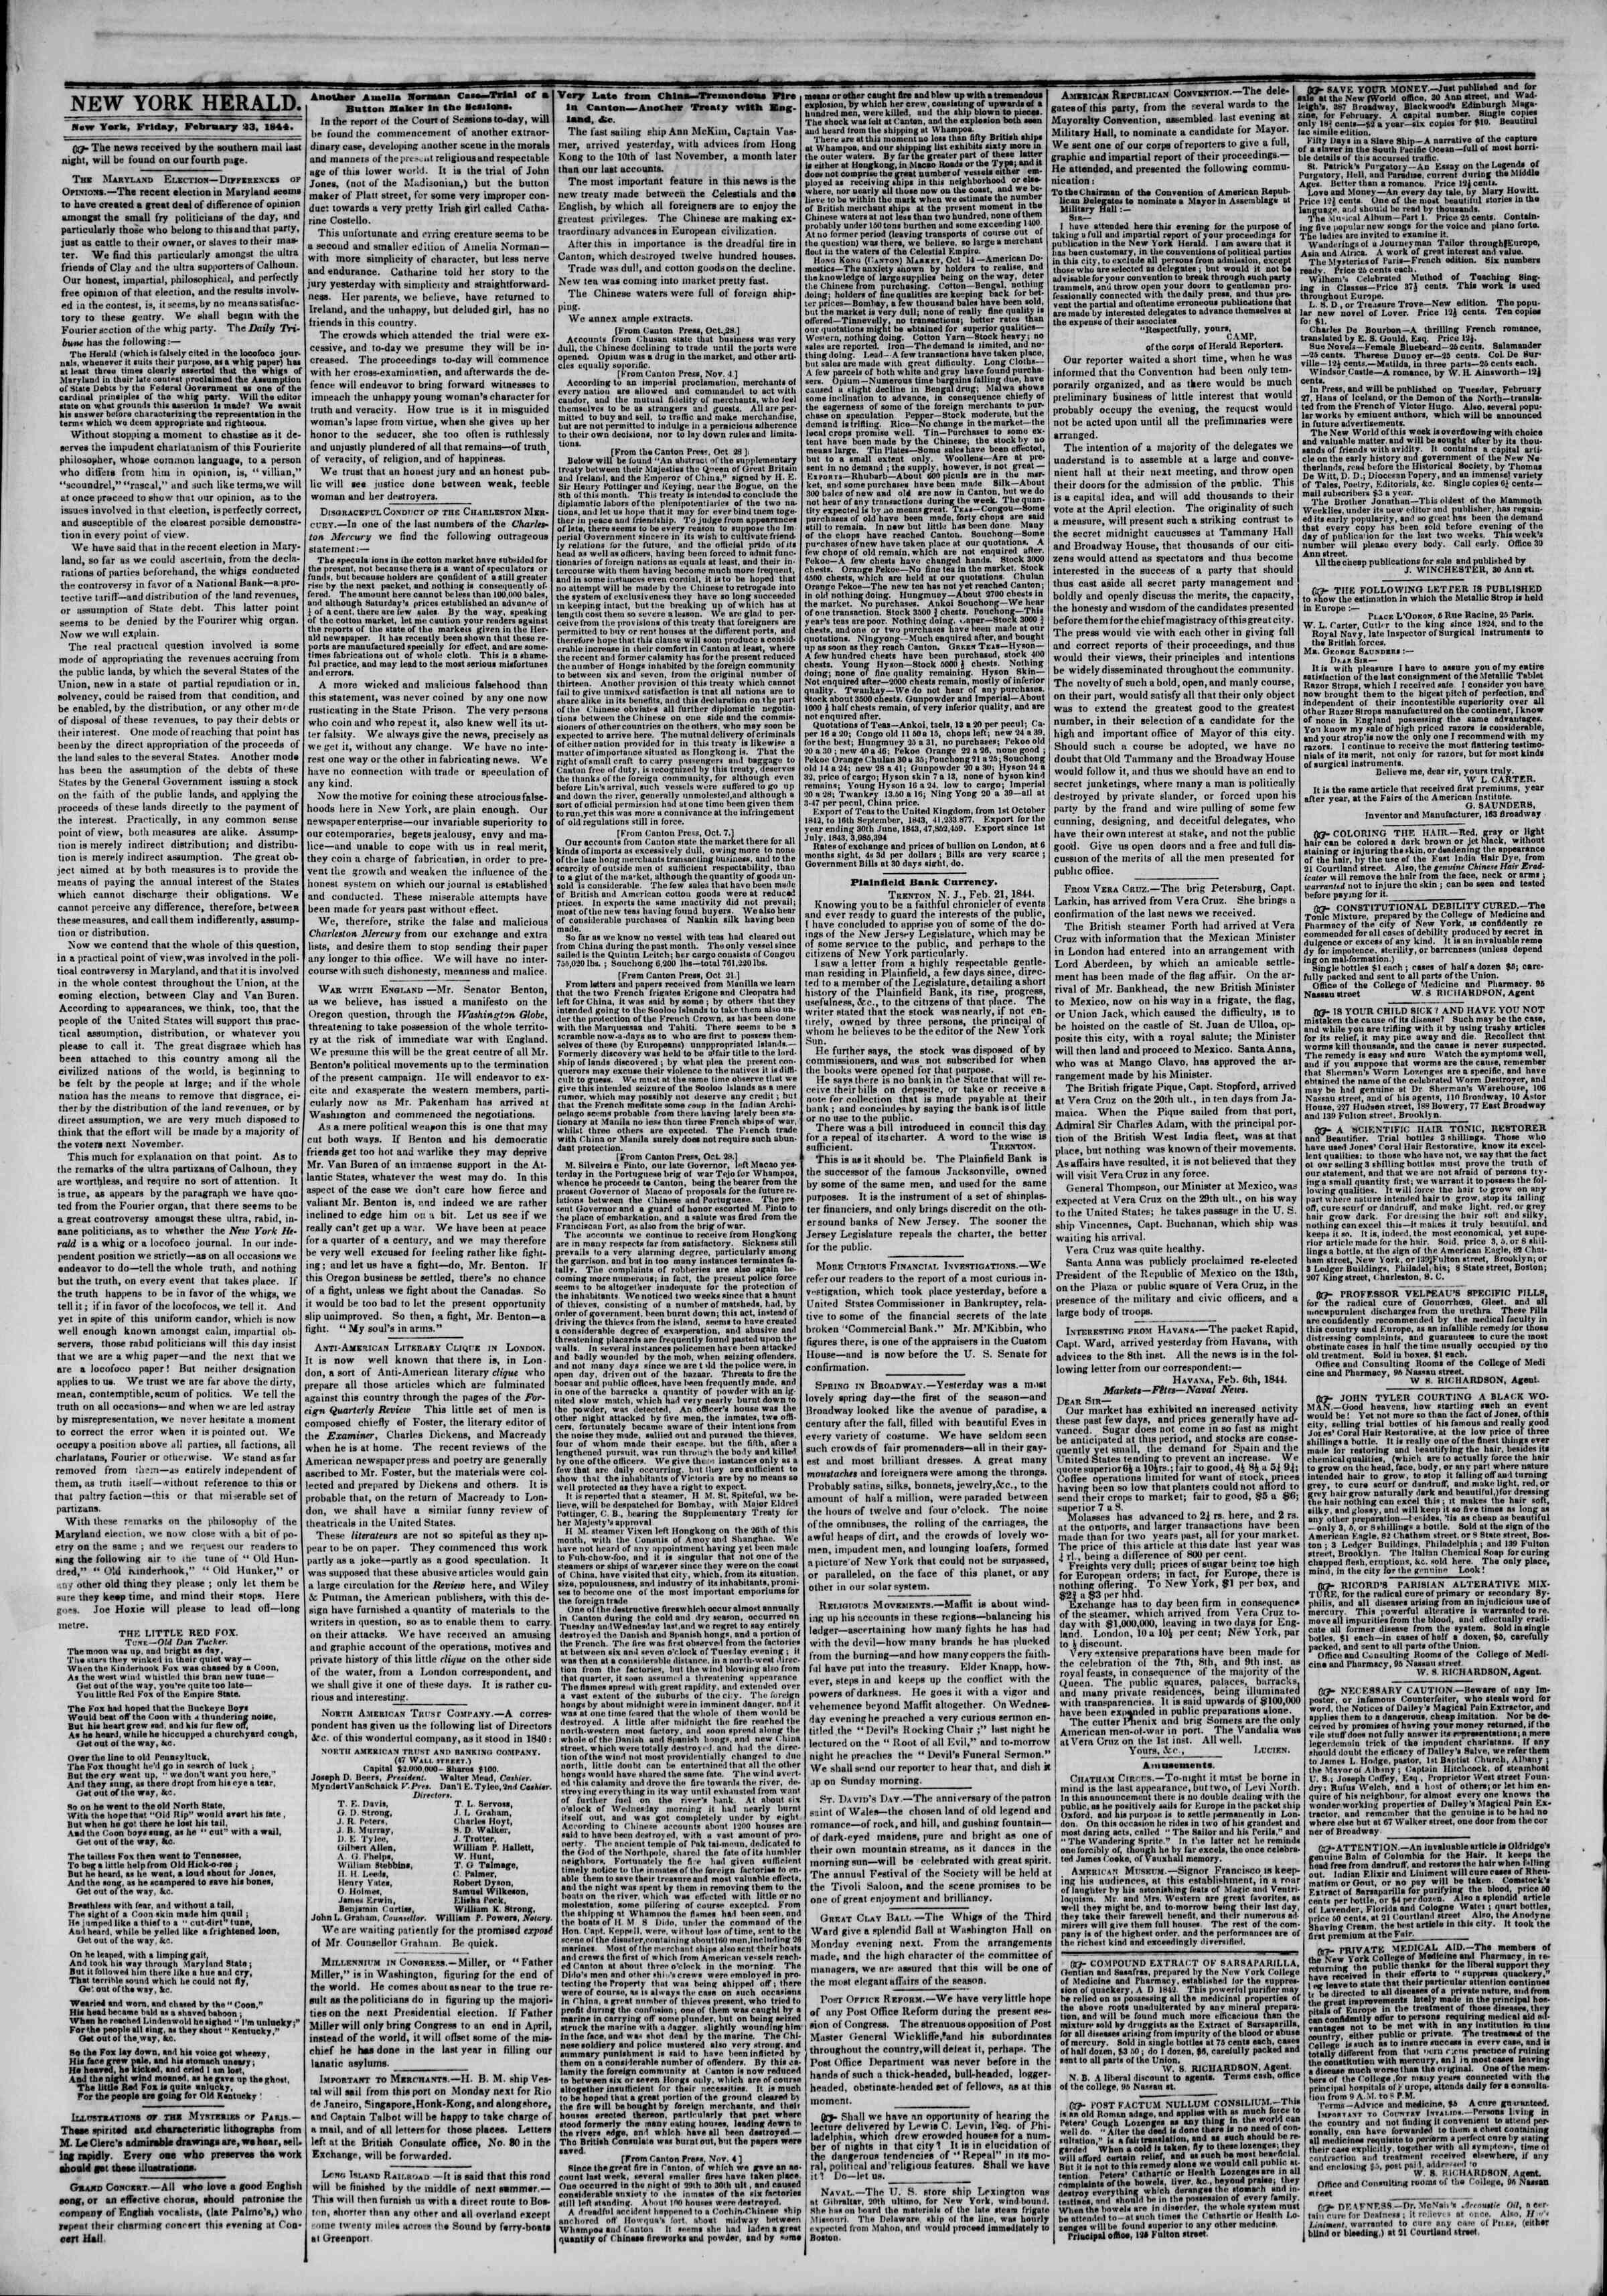 February 23, 1844 Tarihli The New York Herald Gazetesi Sayfa 2